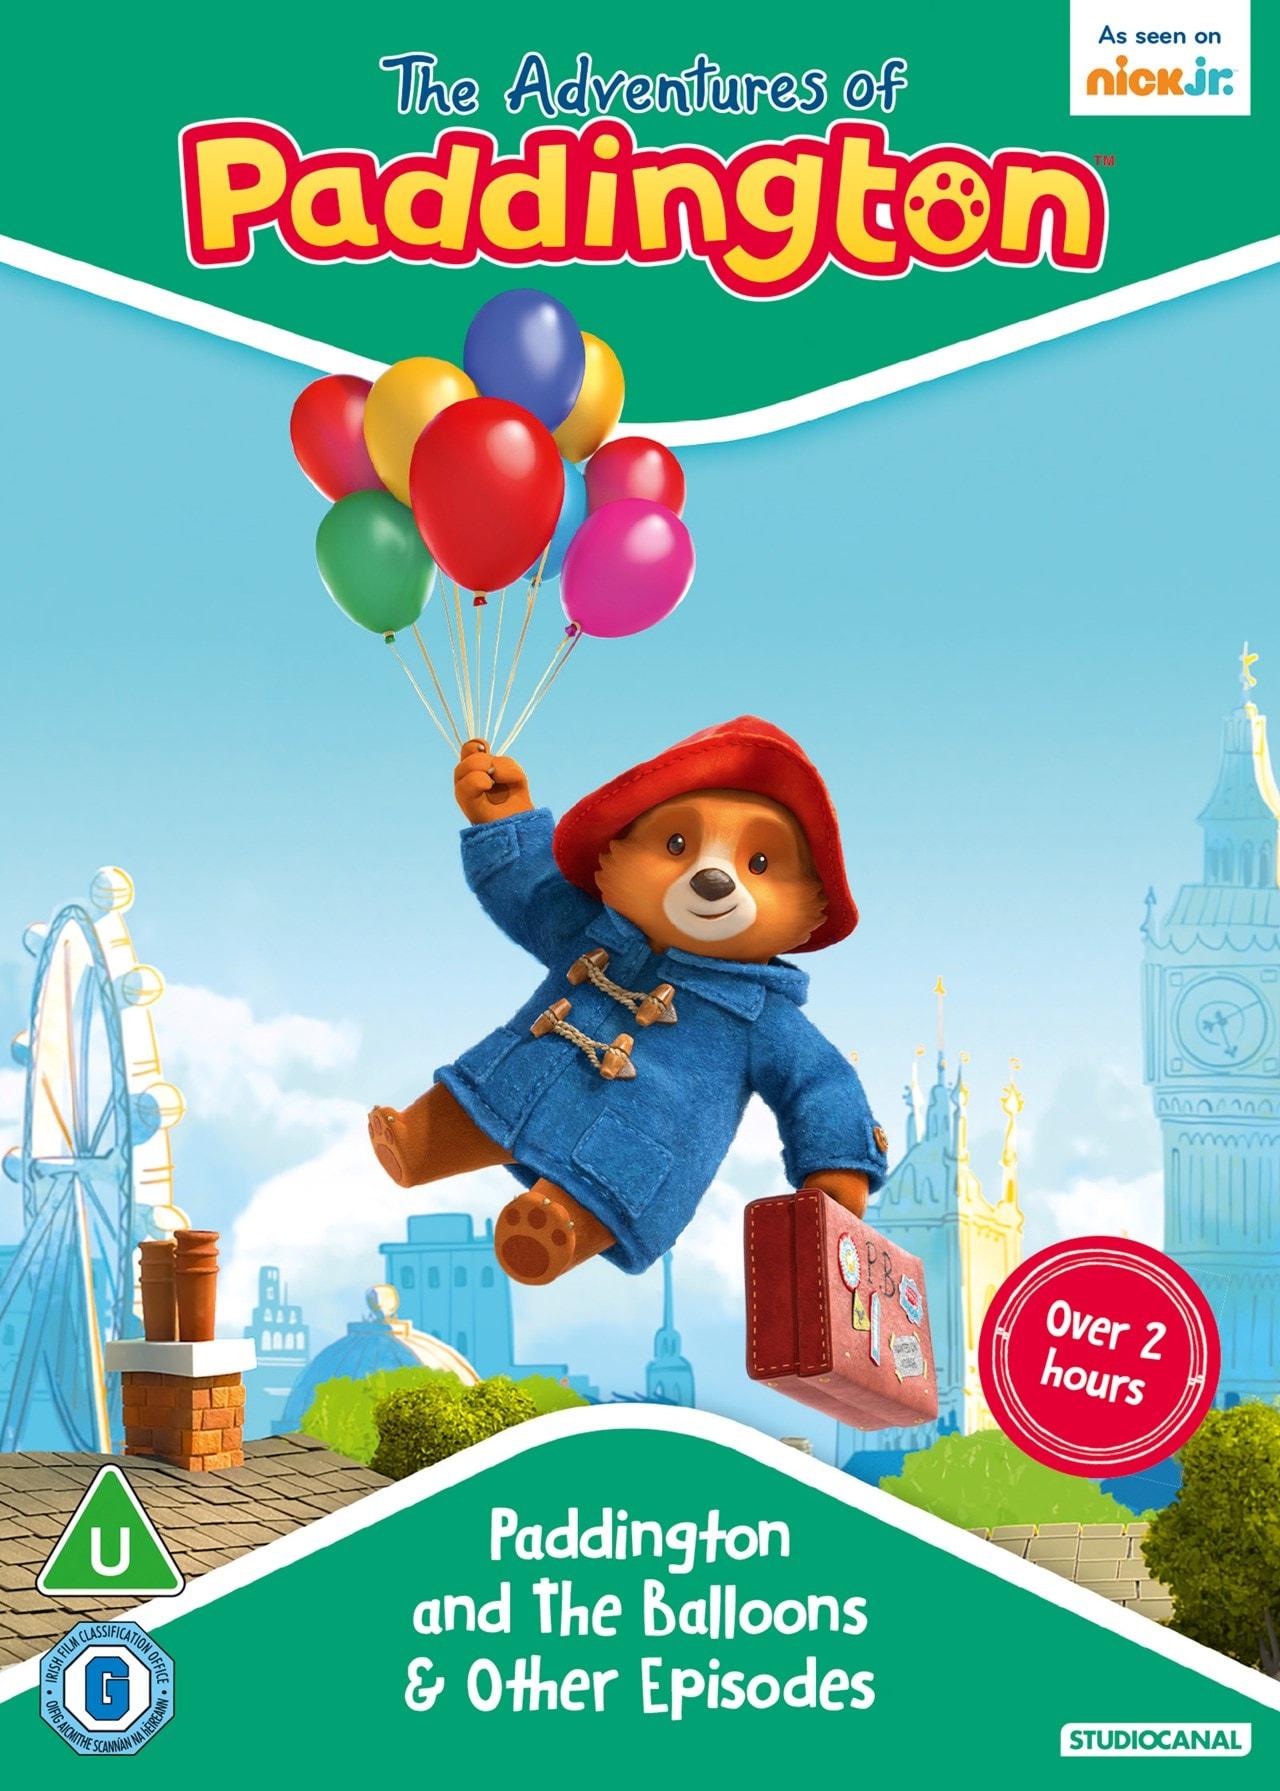 The Adventures of Paddington: Paddington and the Balloons &... - 1